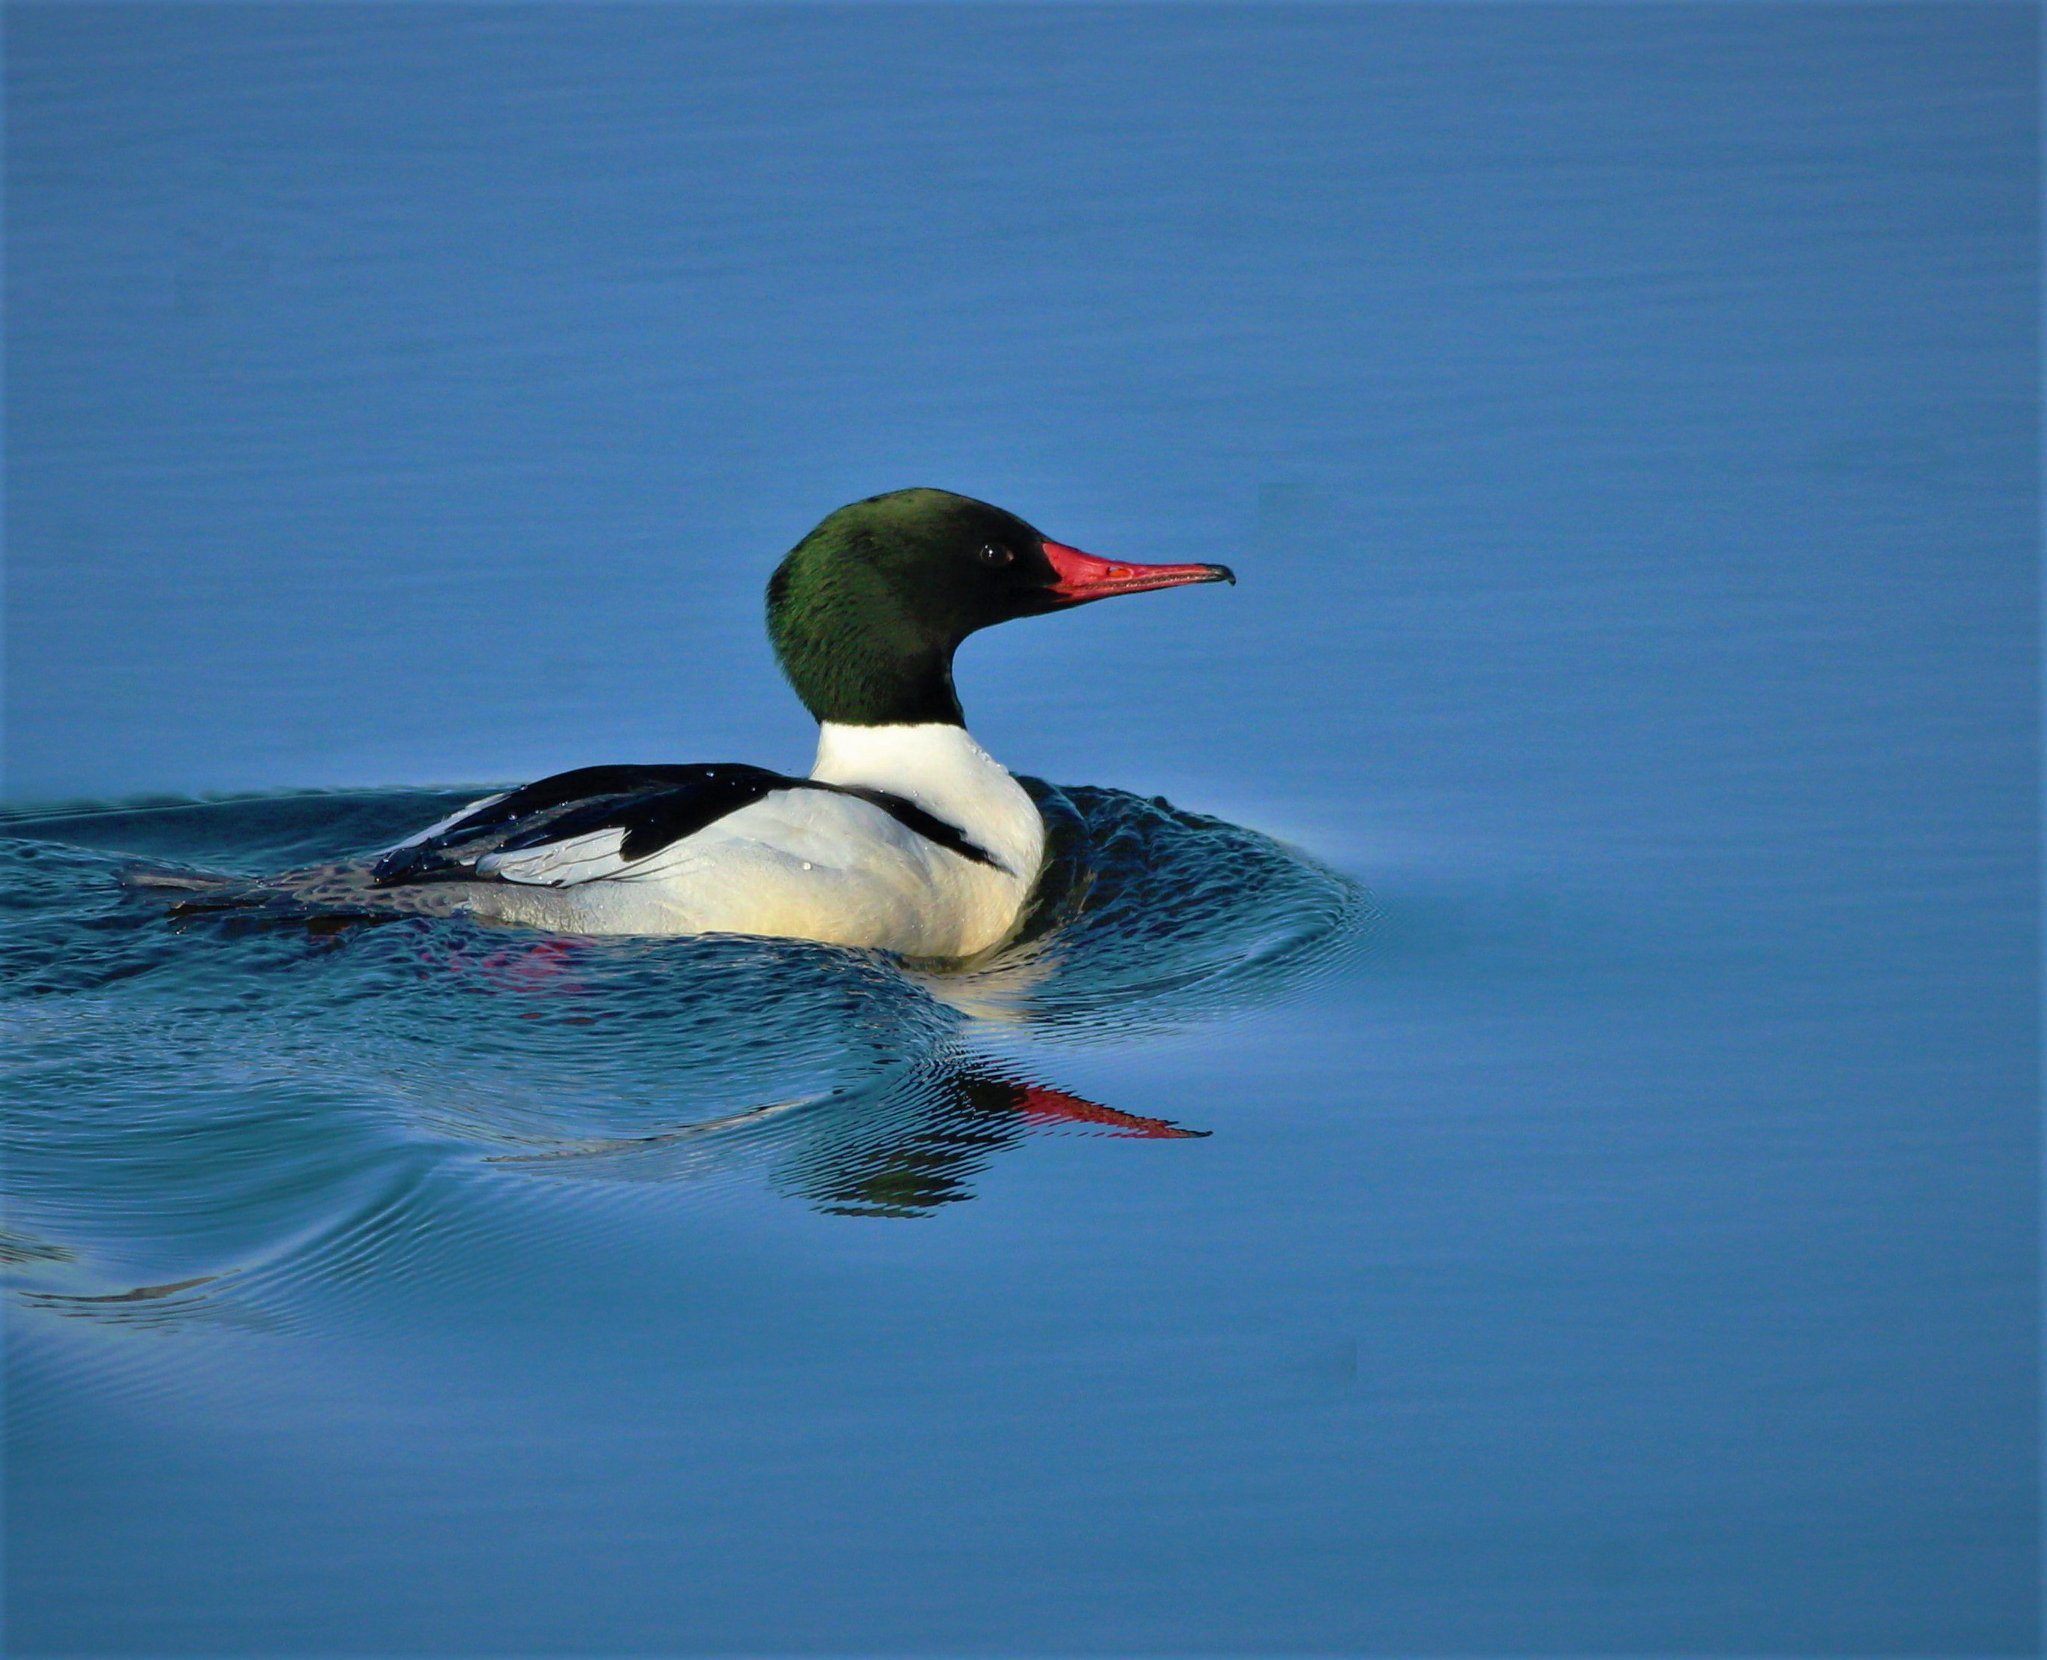 bird_photography_27.jpg